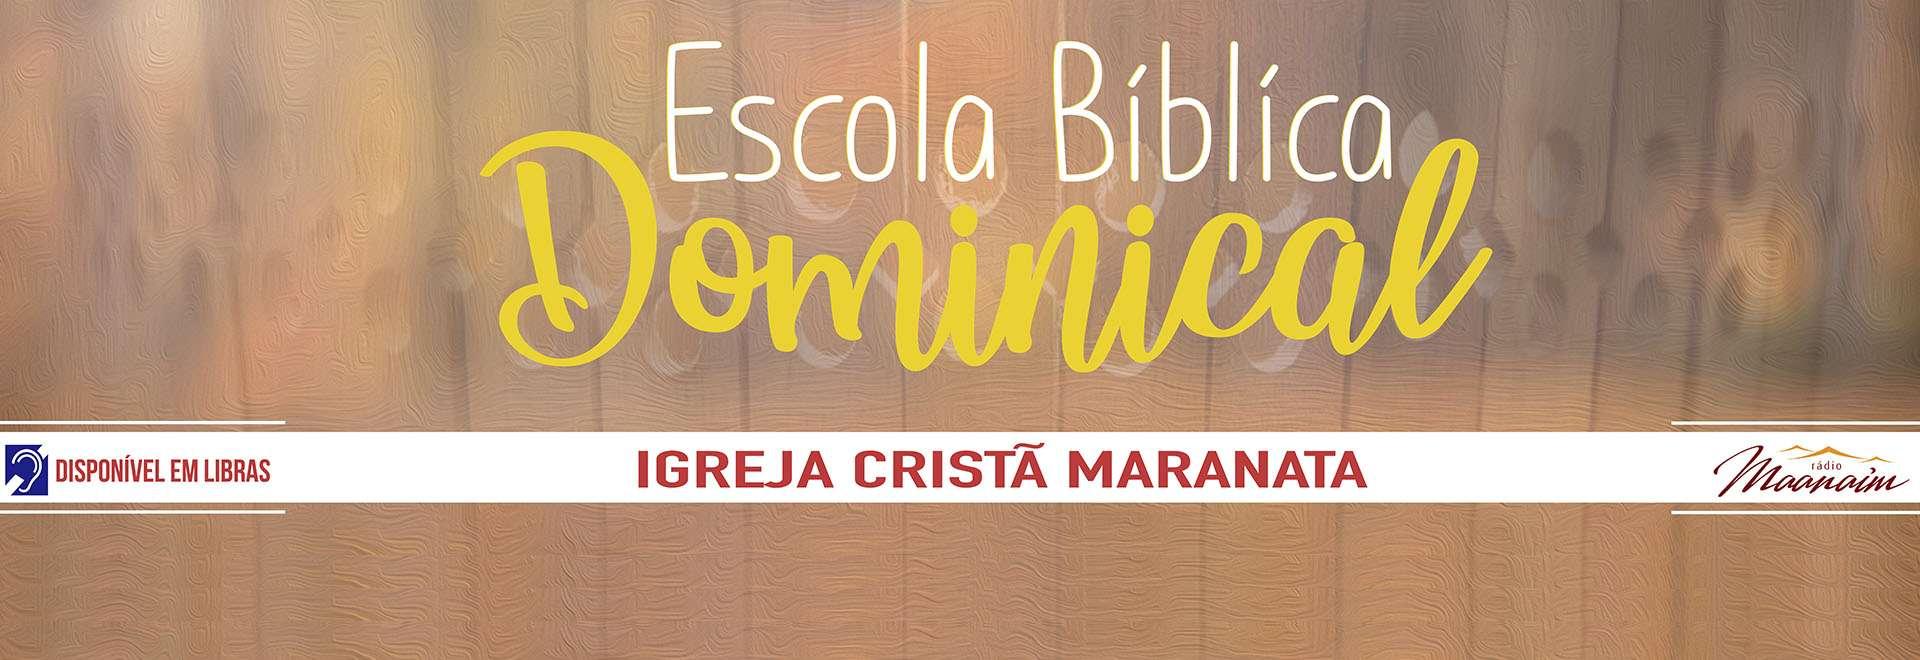 Participações da EBD da Igreja Cristã Maranata - 13/12/2020